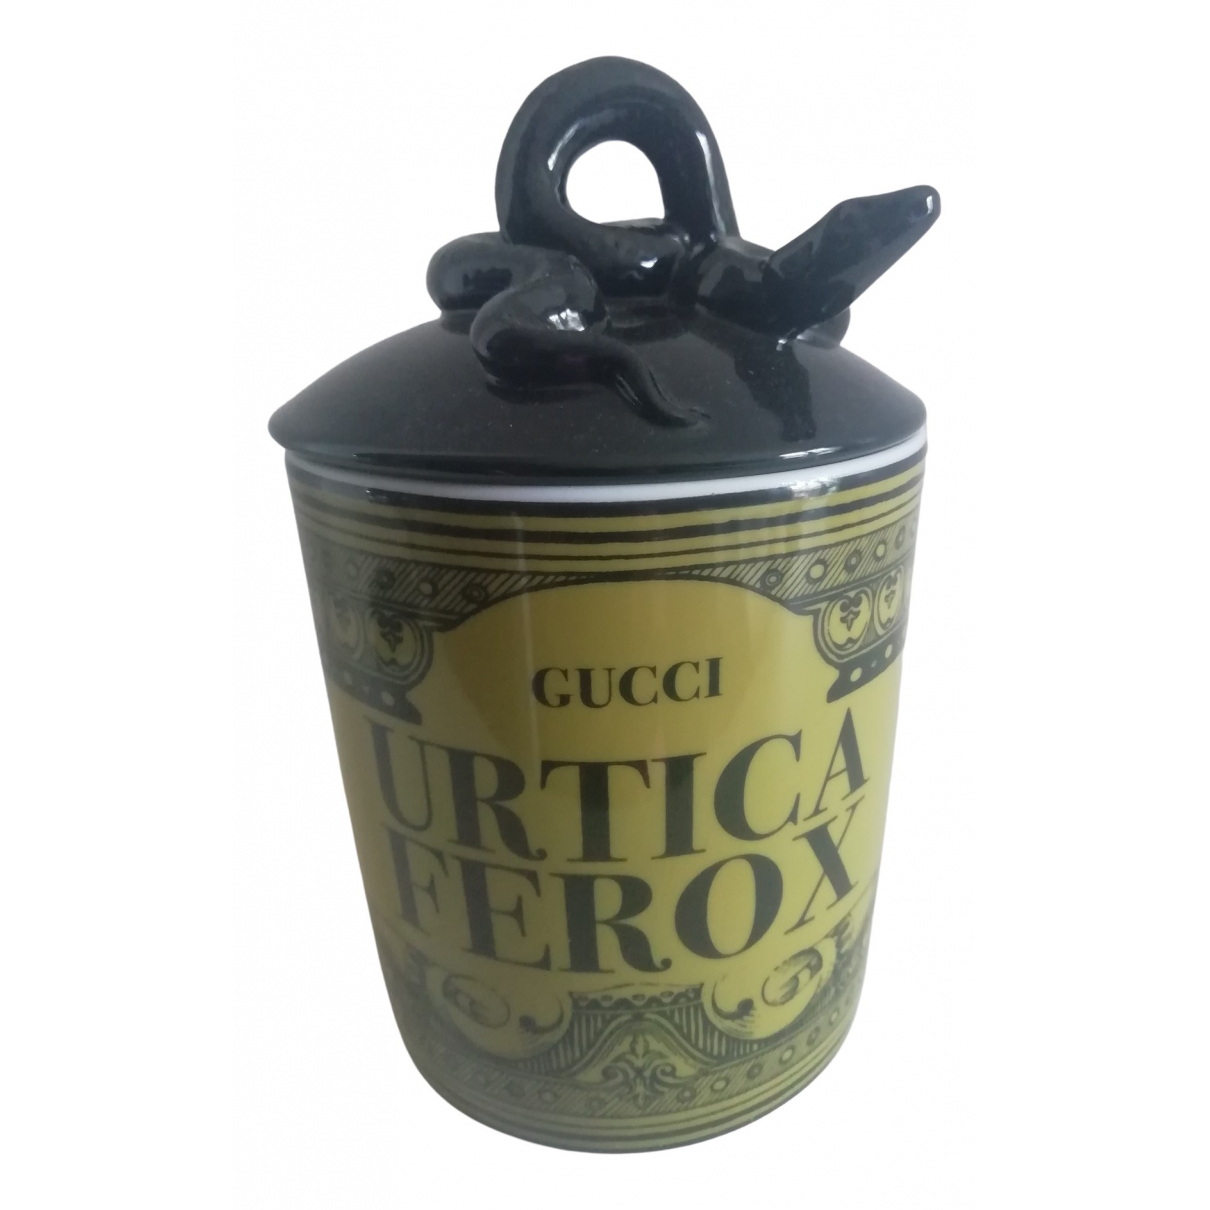 Vela Urtica Ferox de Porcelana Gucci